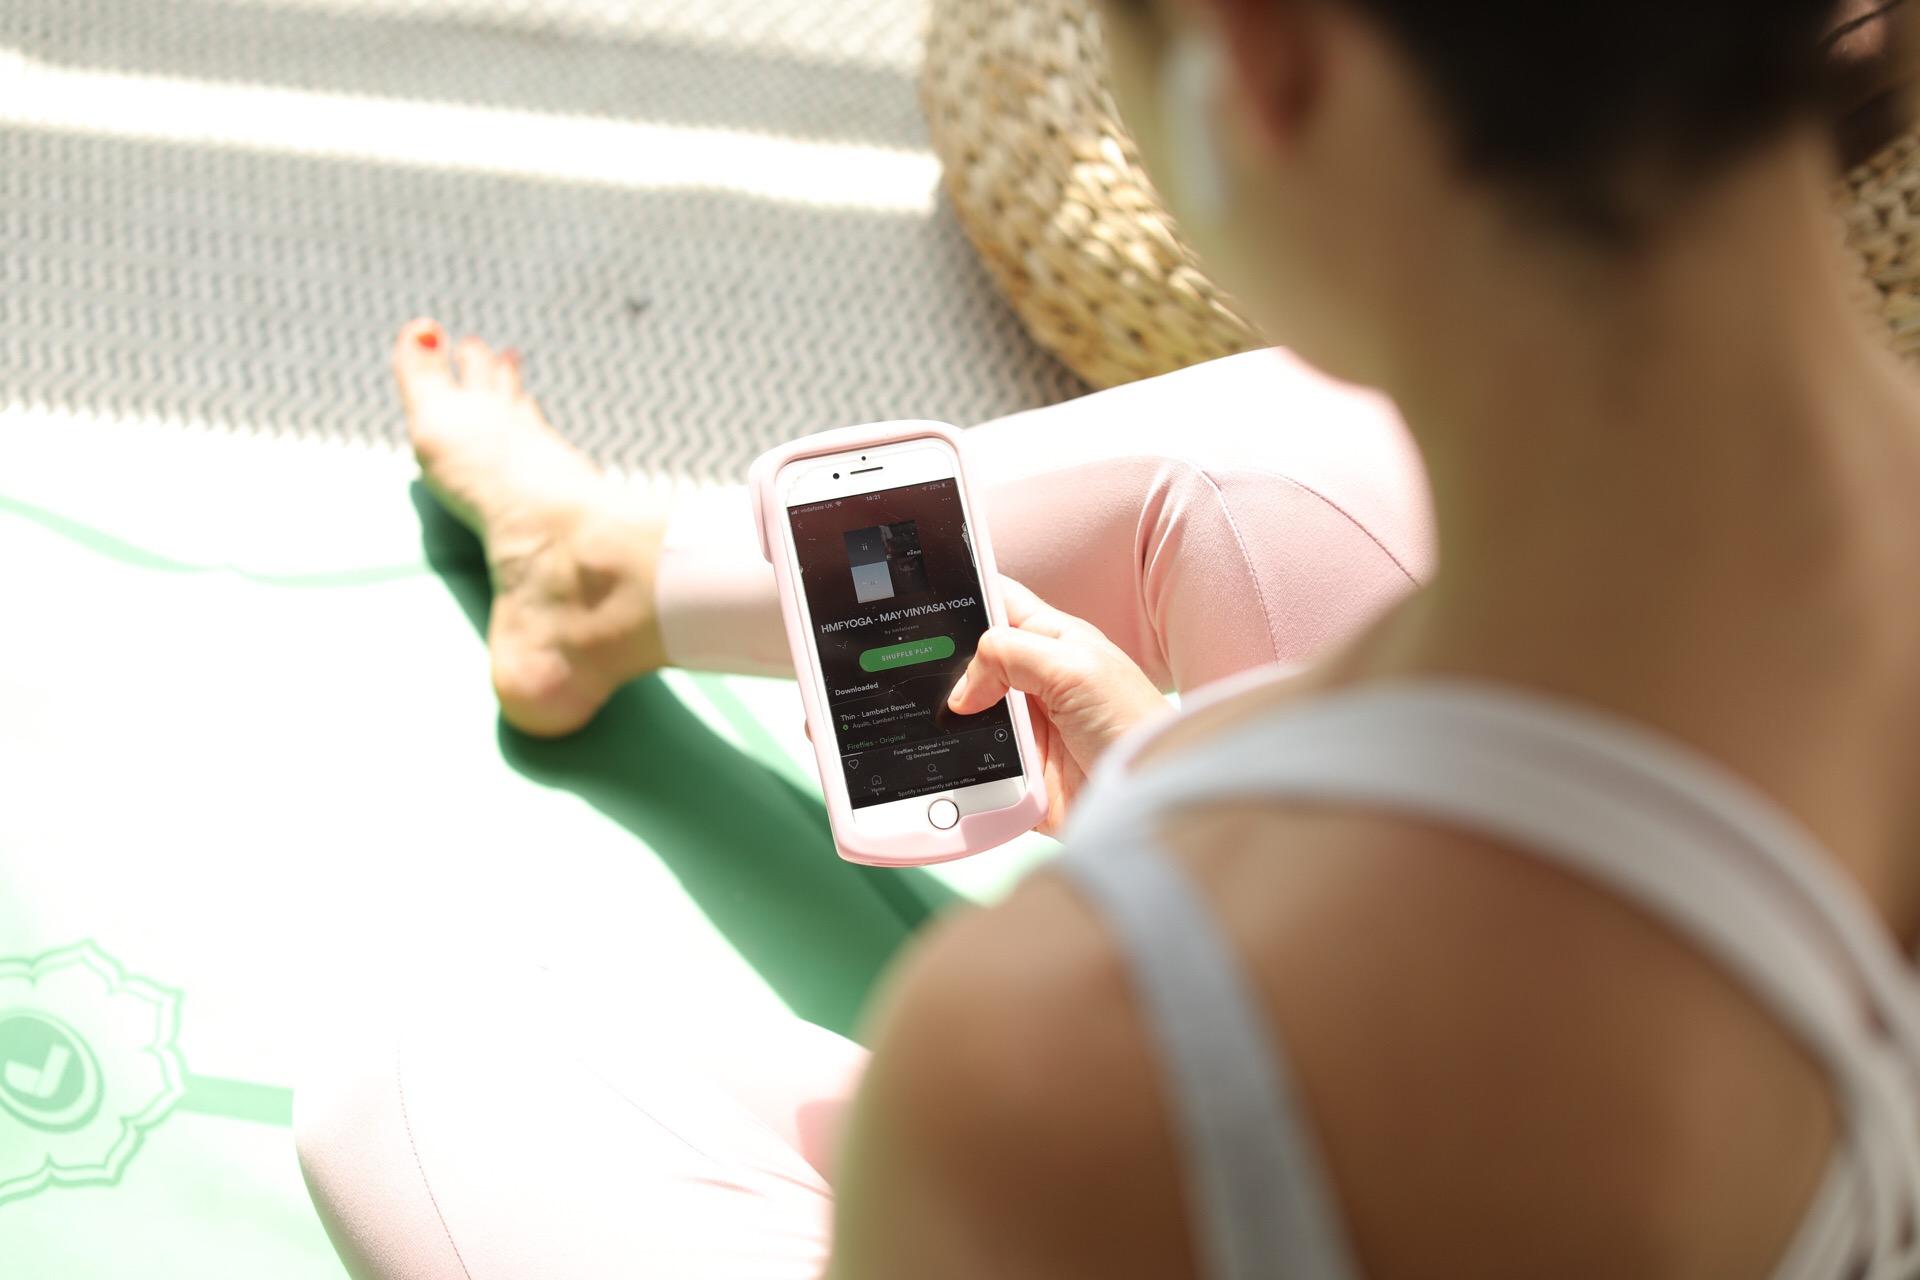 london_yoga_teacher_yoga_playlist_spotify